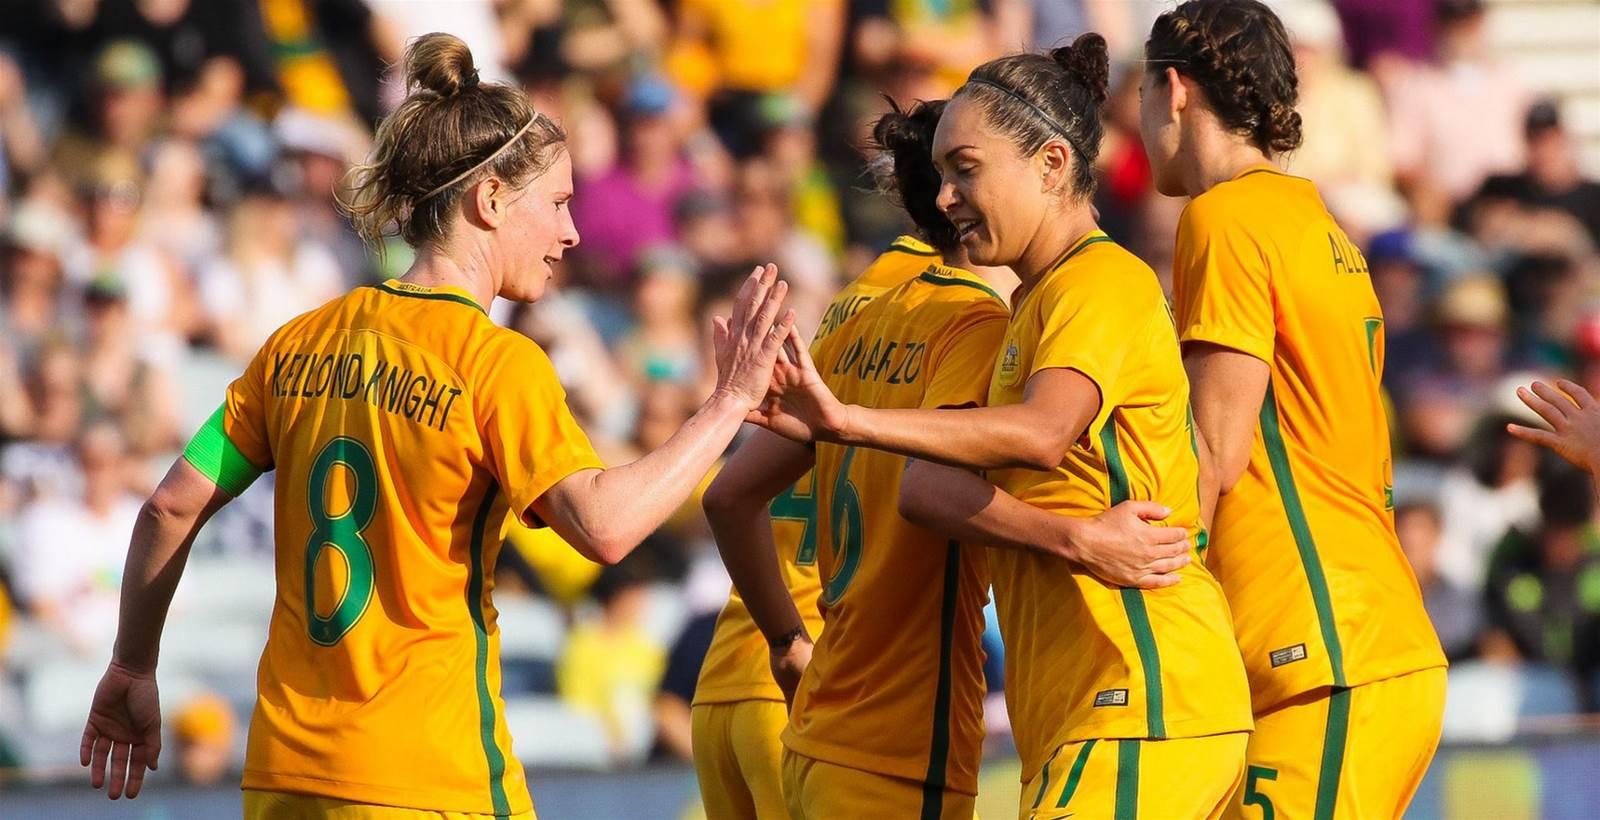 Matildas rise to all time high in FIFA rankings